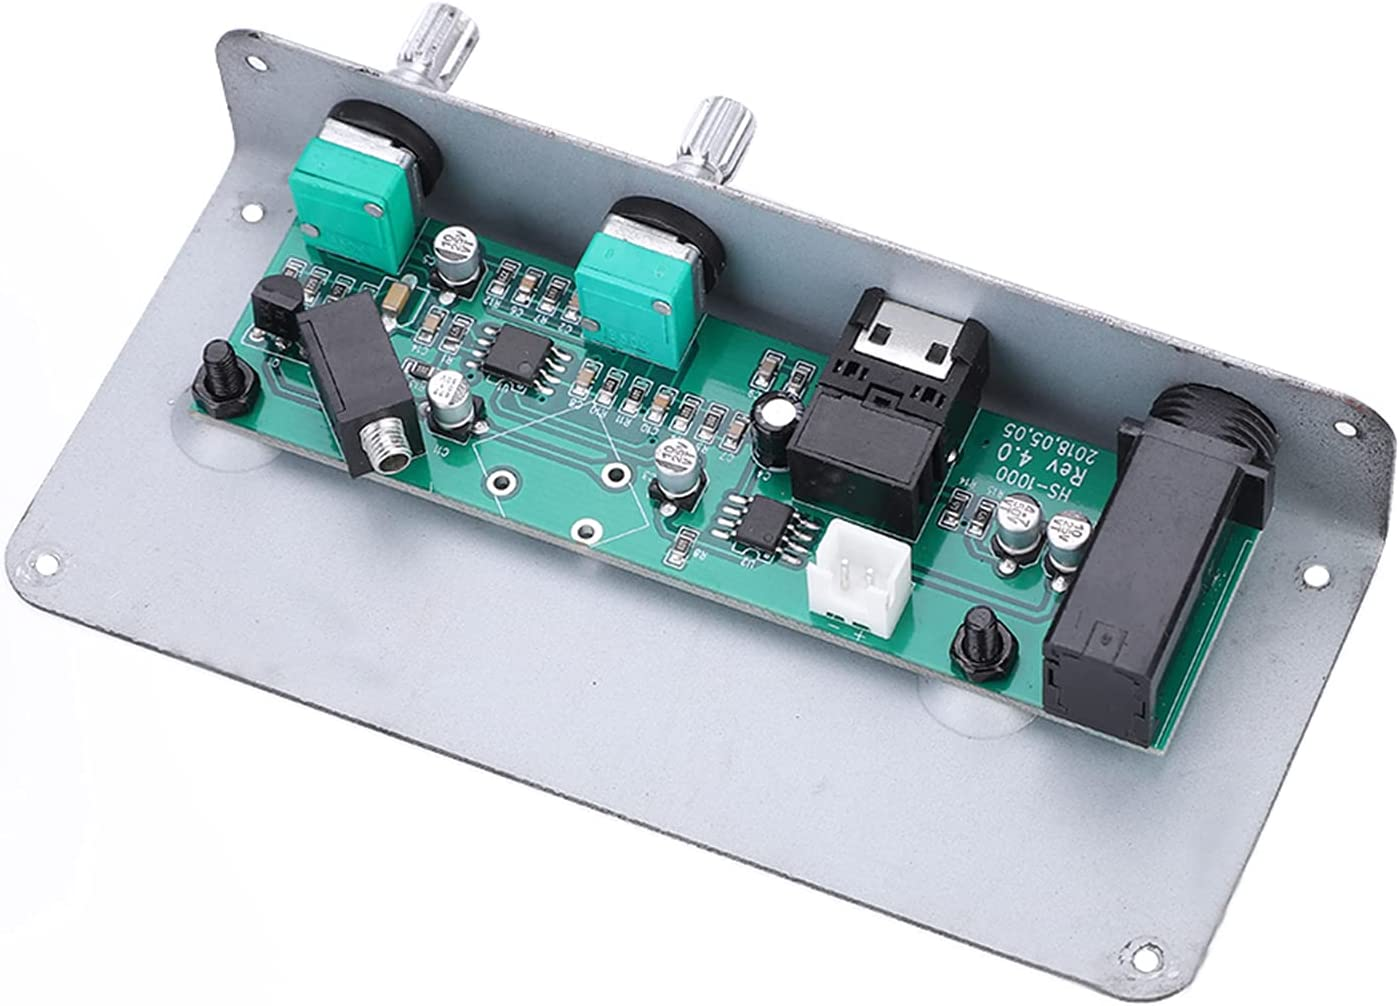 Pastilla EQ de guitarra, SG-20 Pastilla de orificio de sonido magnético de Metal + Plástico DIY Piezas de guitarra silenciosas Larga vida útil para guitarra acústica